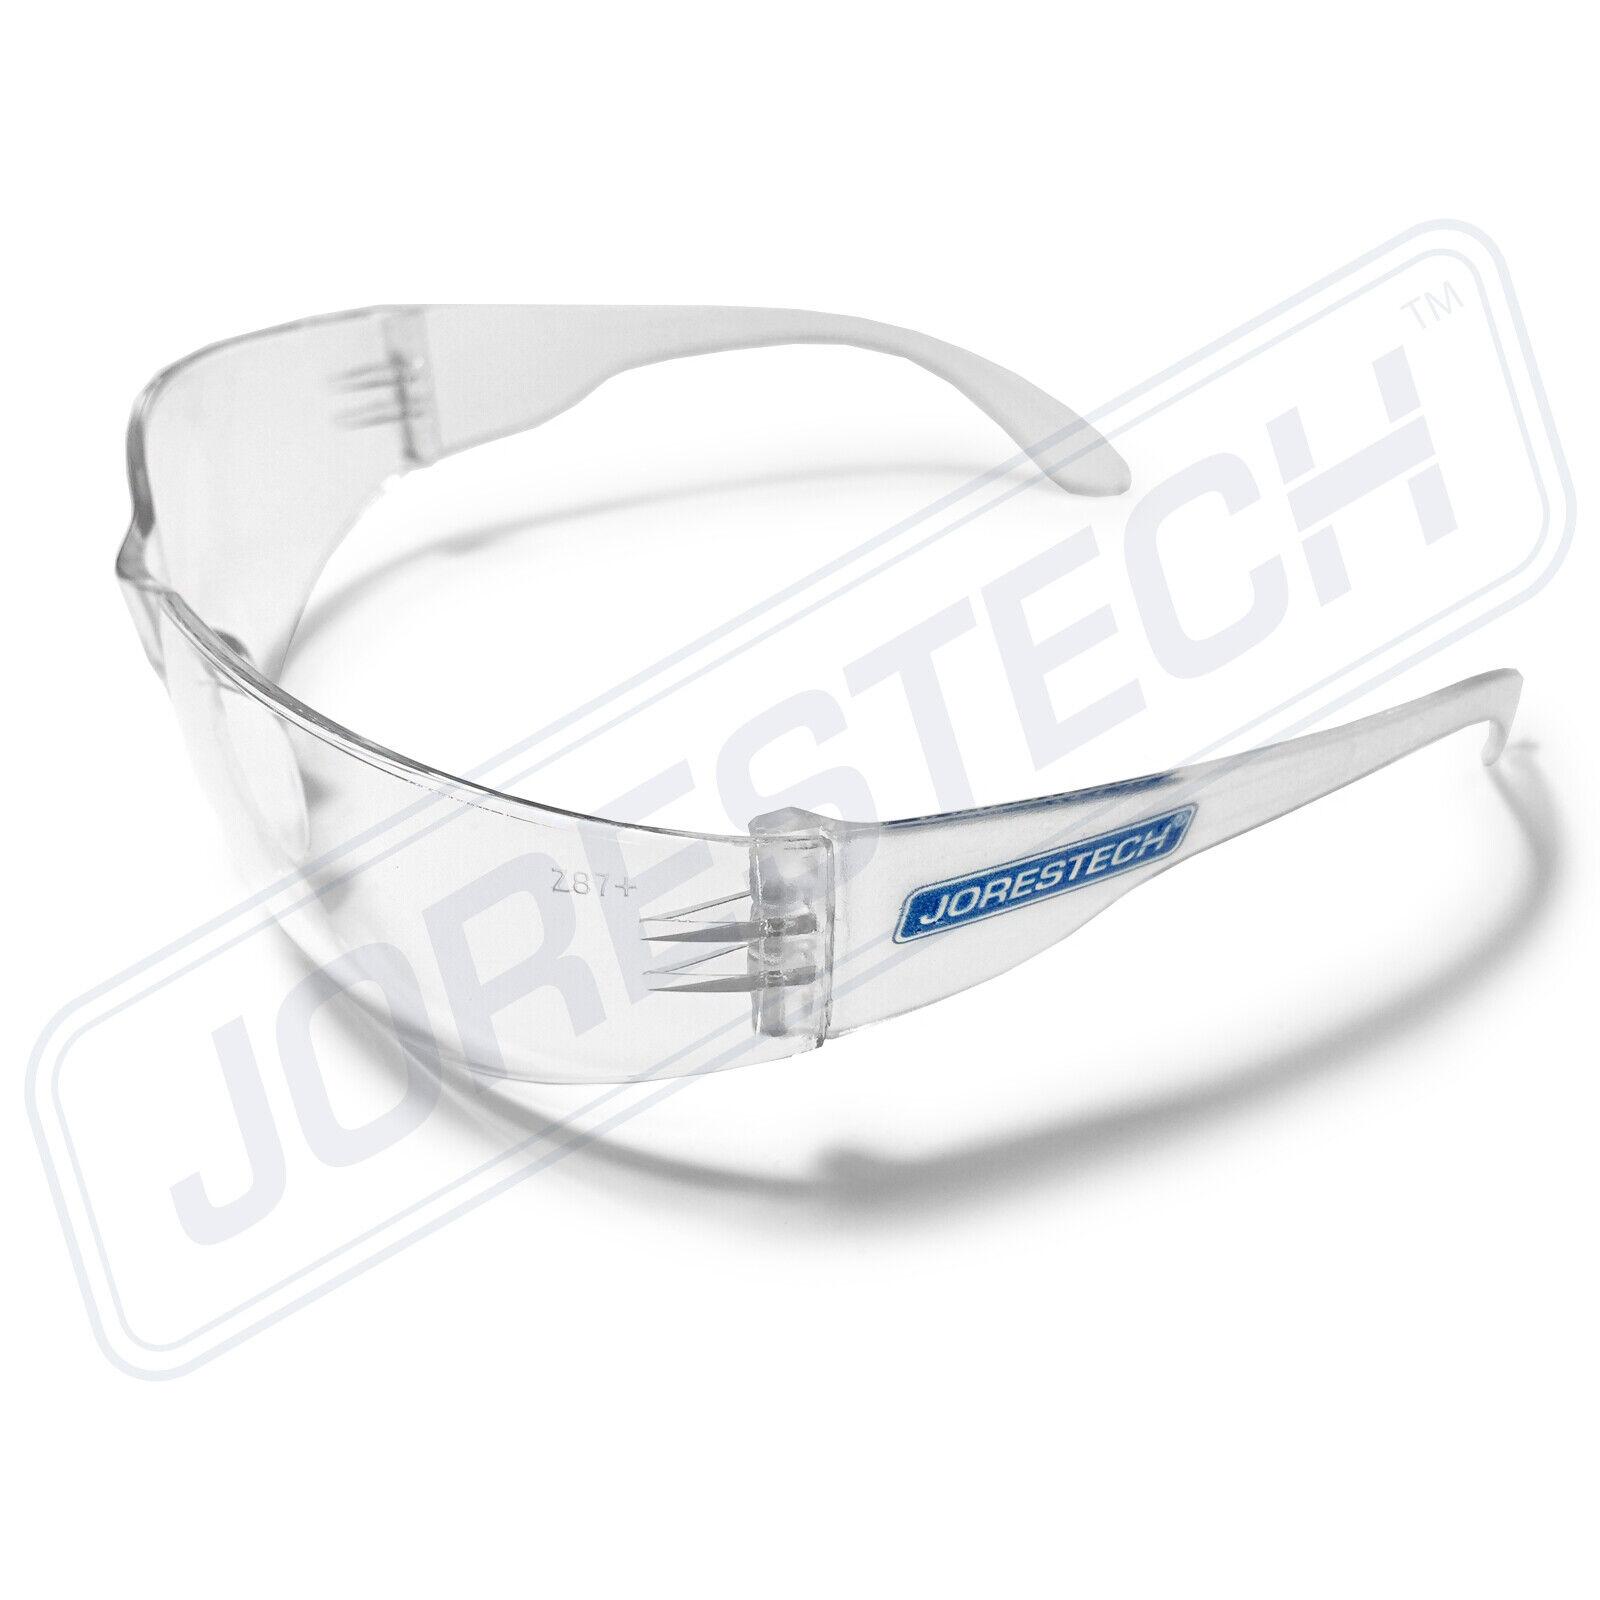 12 PAIR JORESTECH CLEAR UV LENS LOT SAFETY GLASSES BULK NEW 12 PAIRS